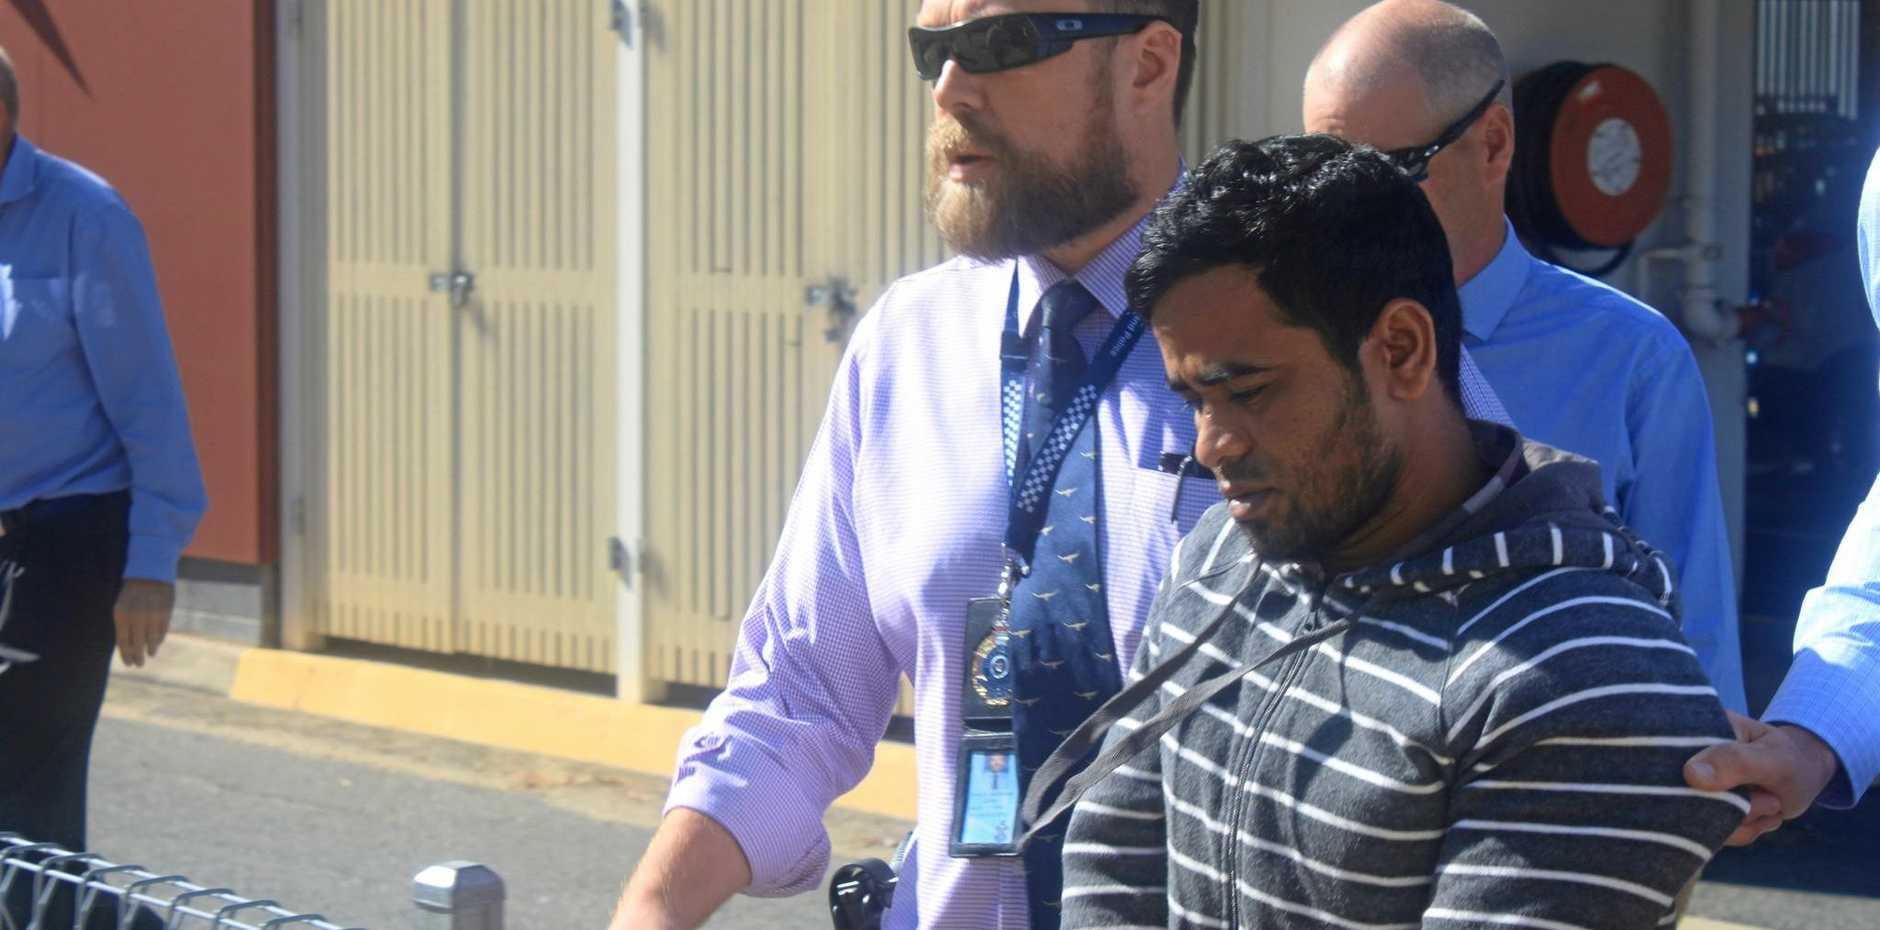 Mohammed Khan allegedly murdered Syeid Alam